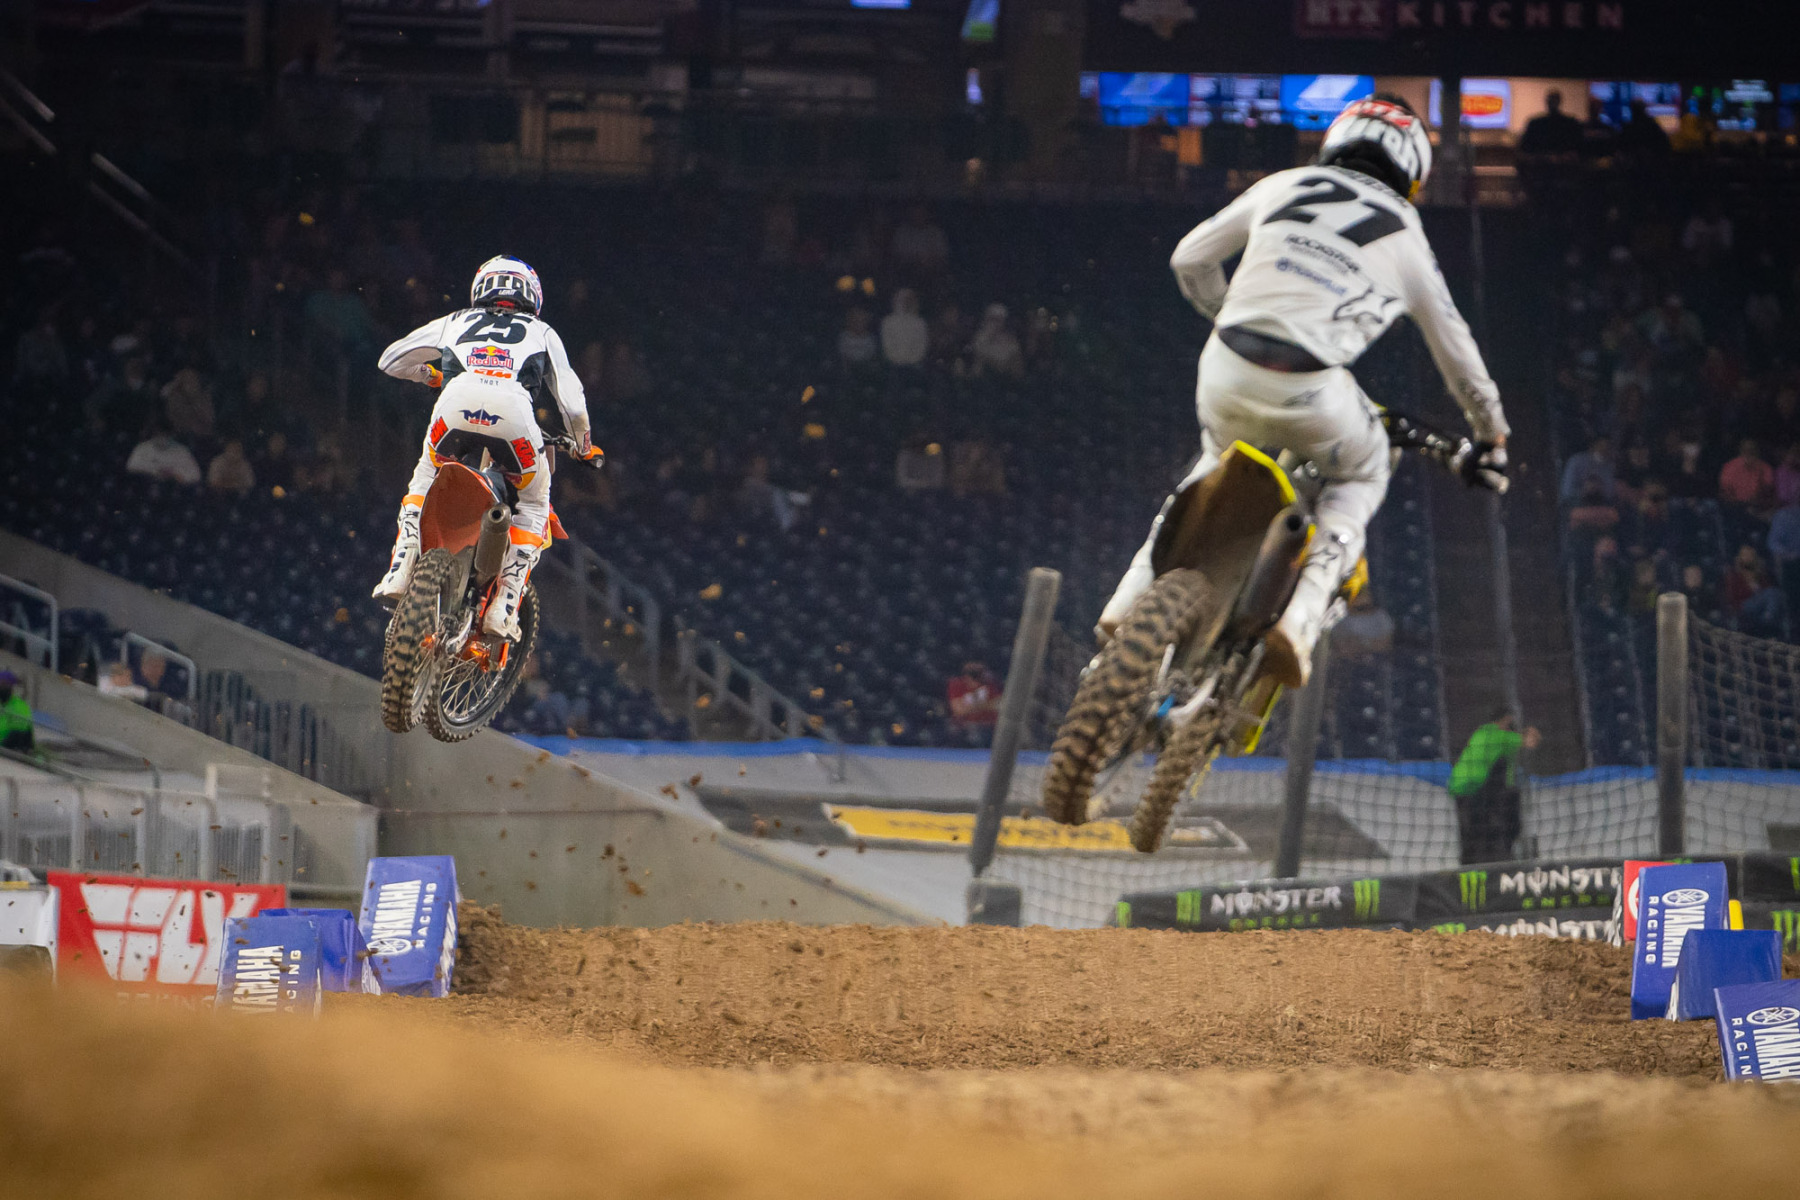 2021-Houston-Two-Supercross_Kickstart_0829